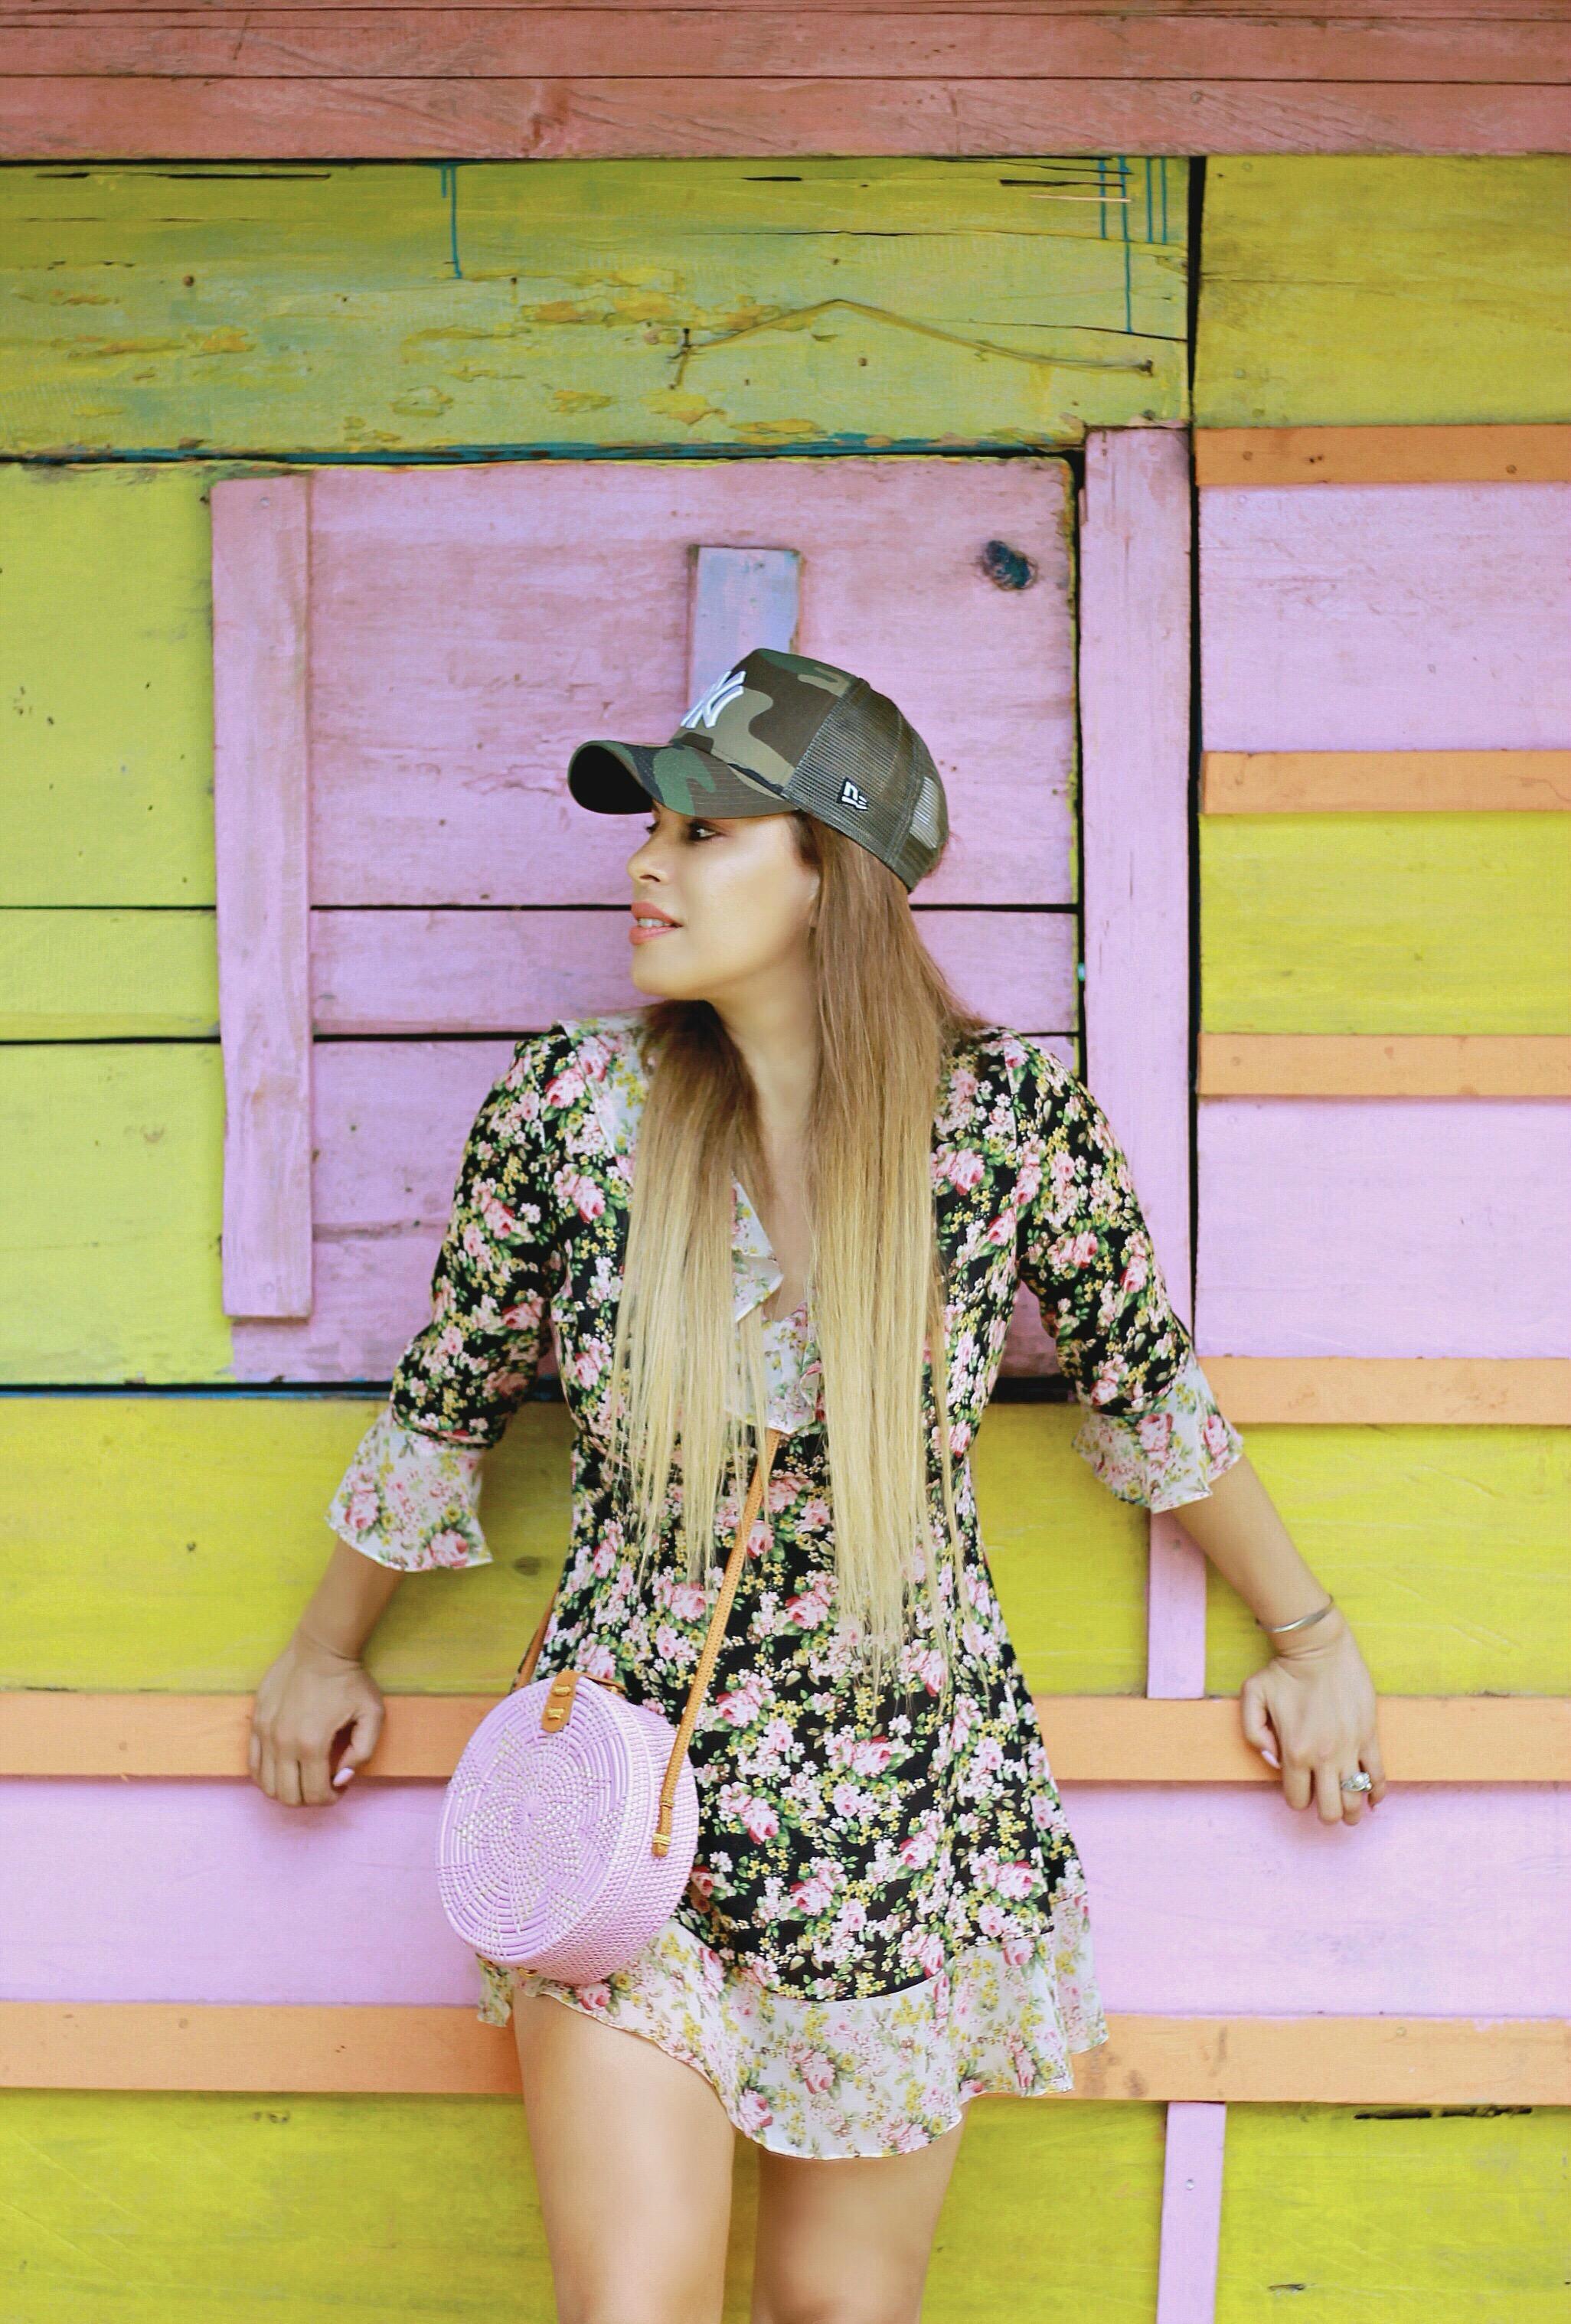 Tamara Chloé, Kei Islands, 5 tips to slay when mixing prints, Pink Bali bag